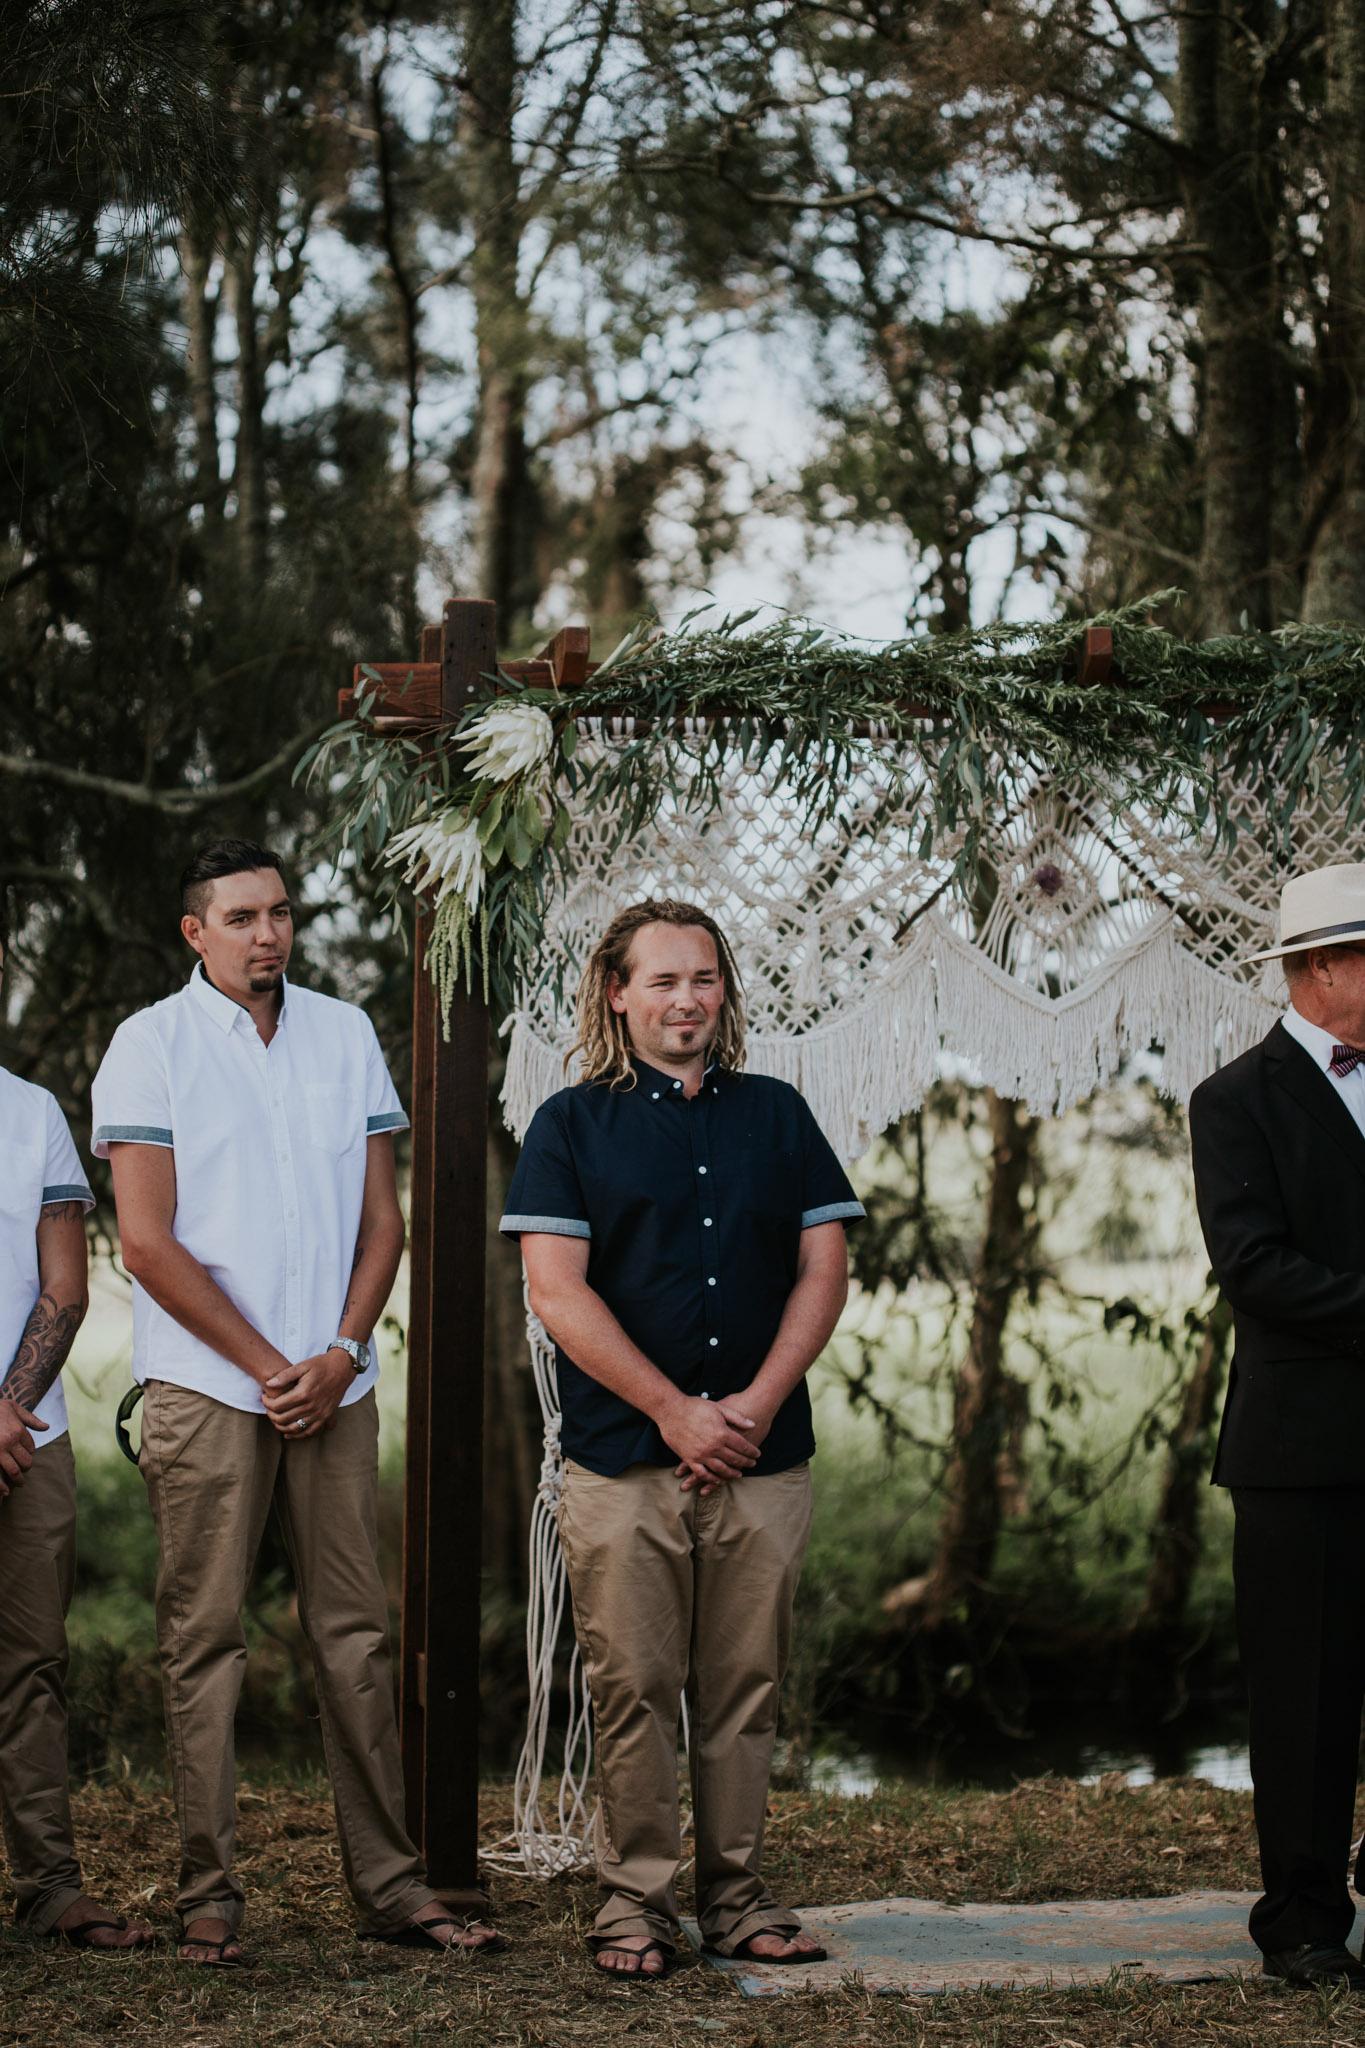 Tara_Luke_Jamberoo_Honey_farm_wedding-53.jpg